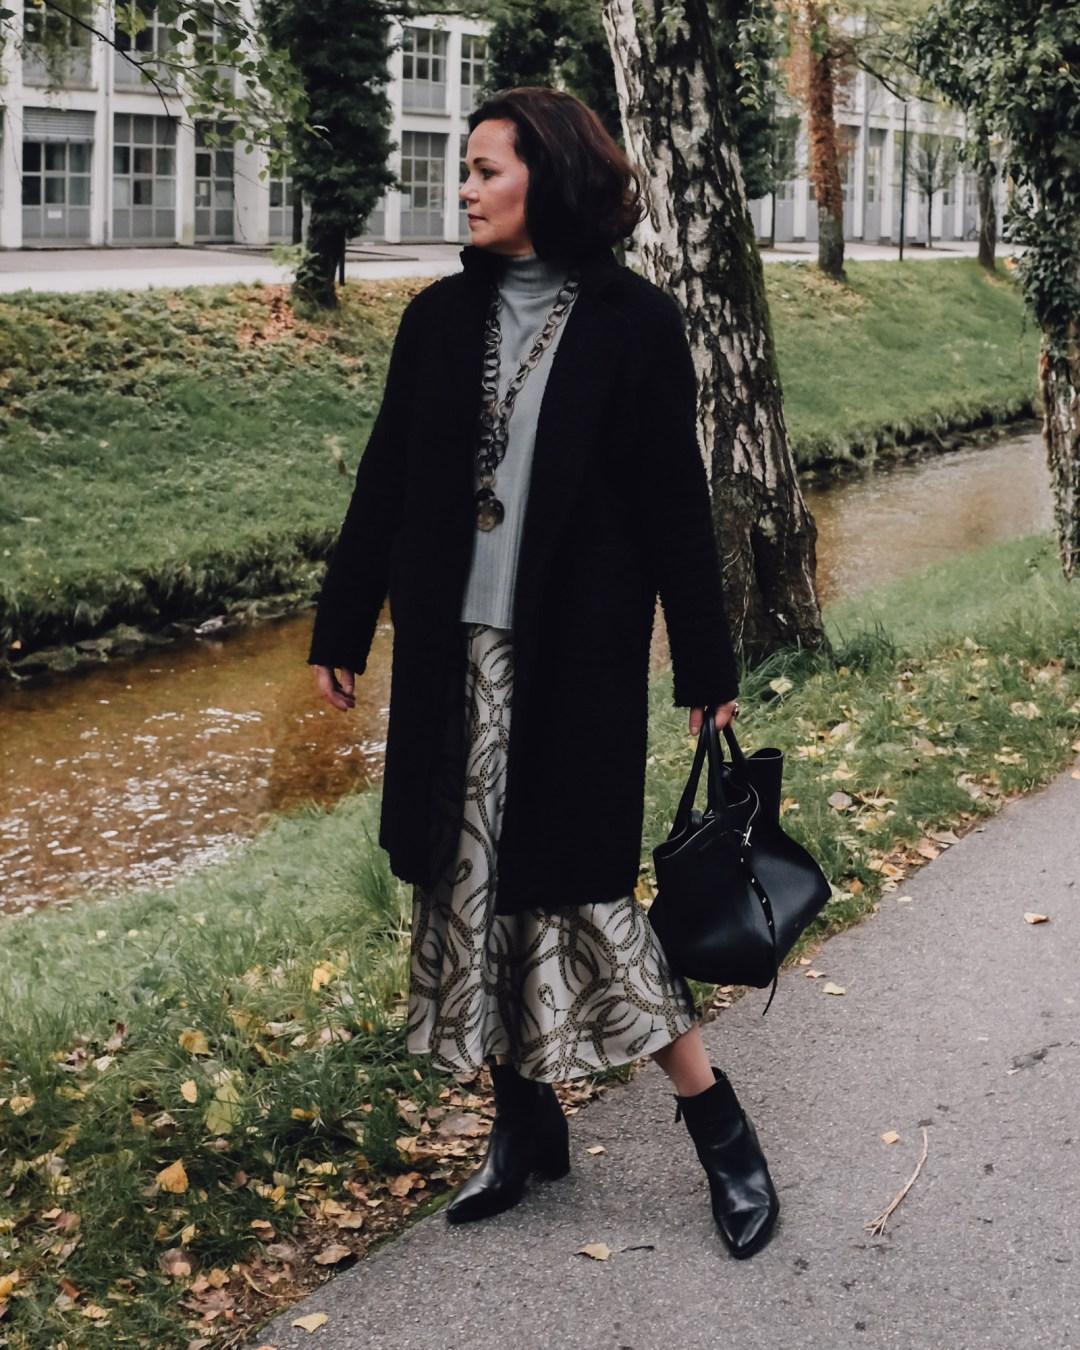 Inastil, Hermbstmode, Rock, Salbeigrün, Mintgrün, Autumnfashion, Modeberatung, Ue50Mode, Üe50blogger, Modeblogger